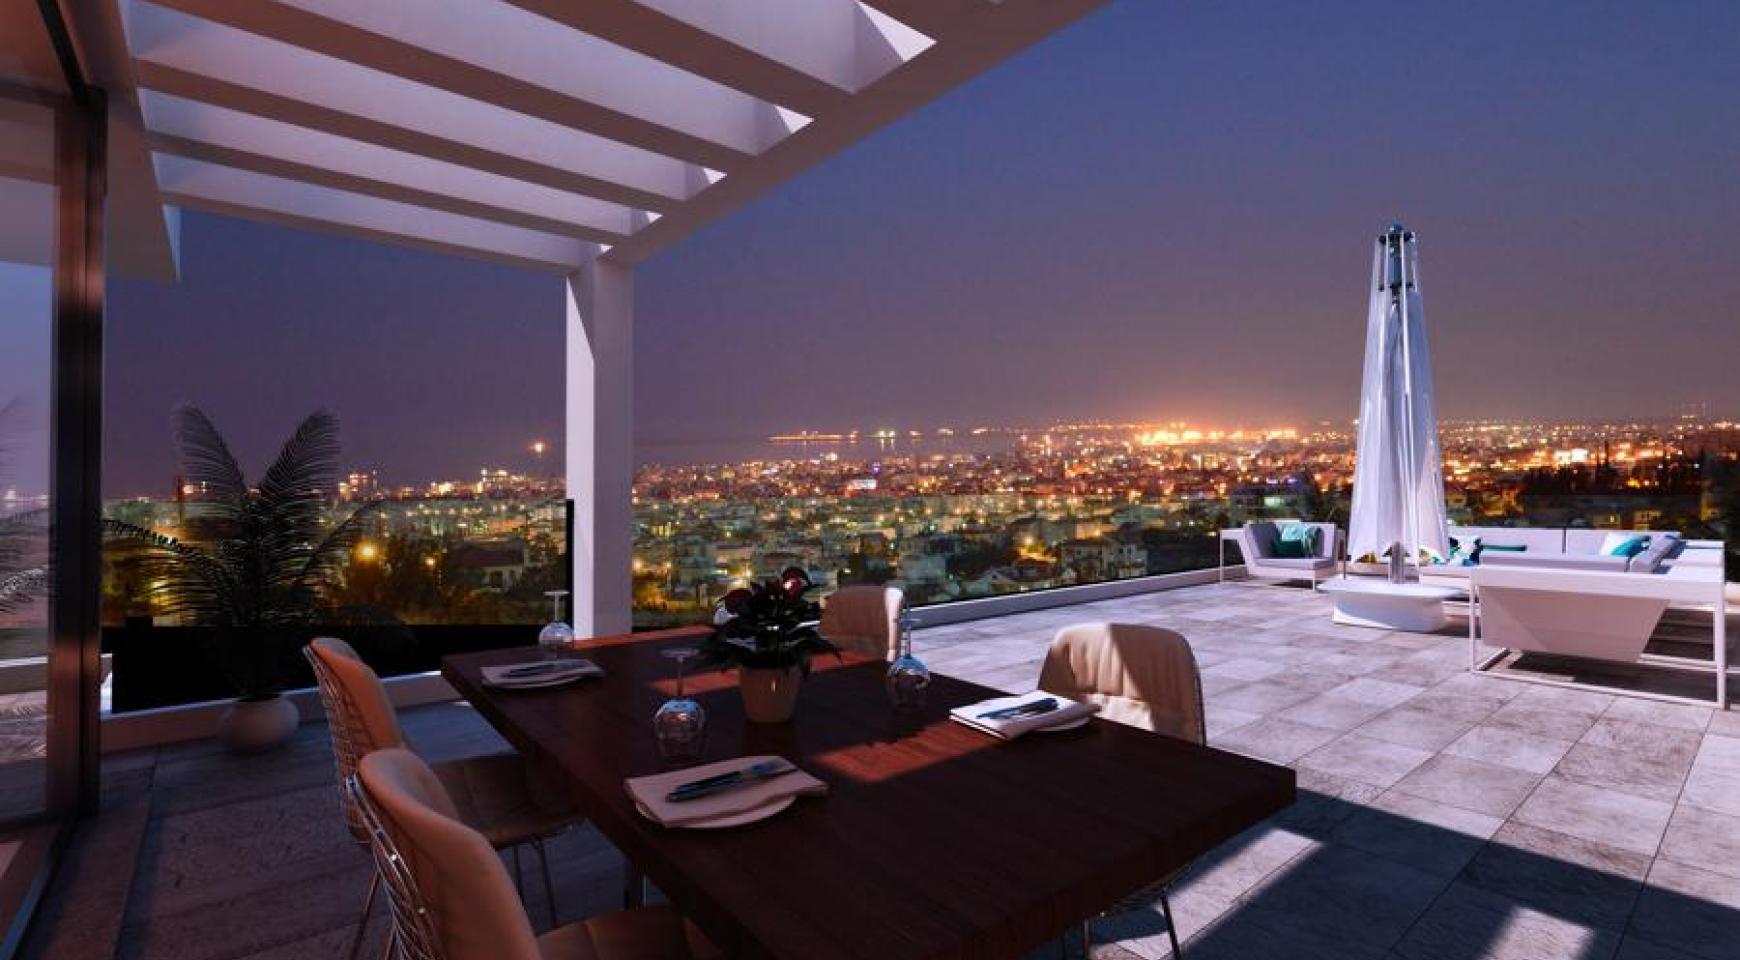 New 2 Bedroom Apartment with Garden - 3